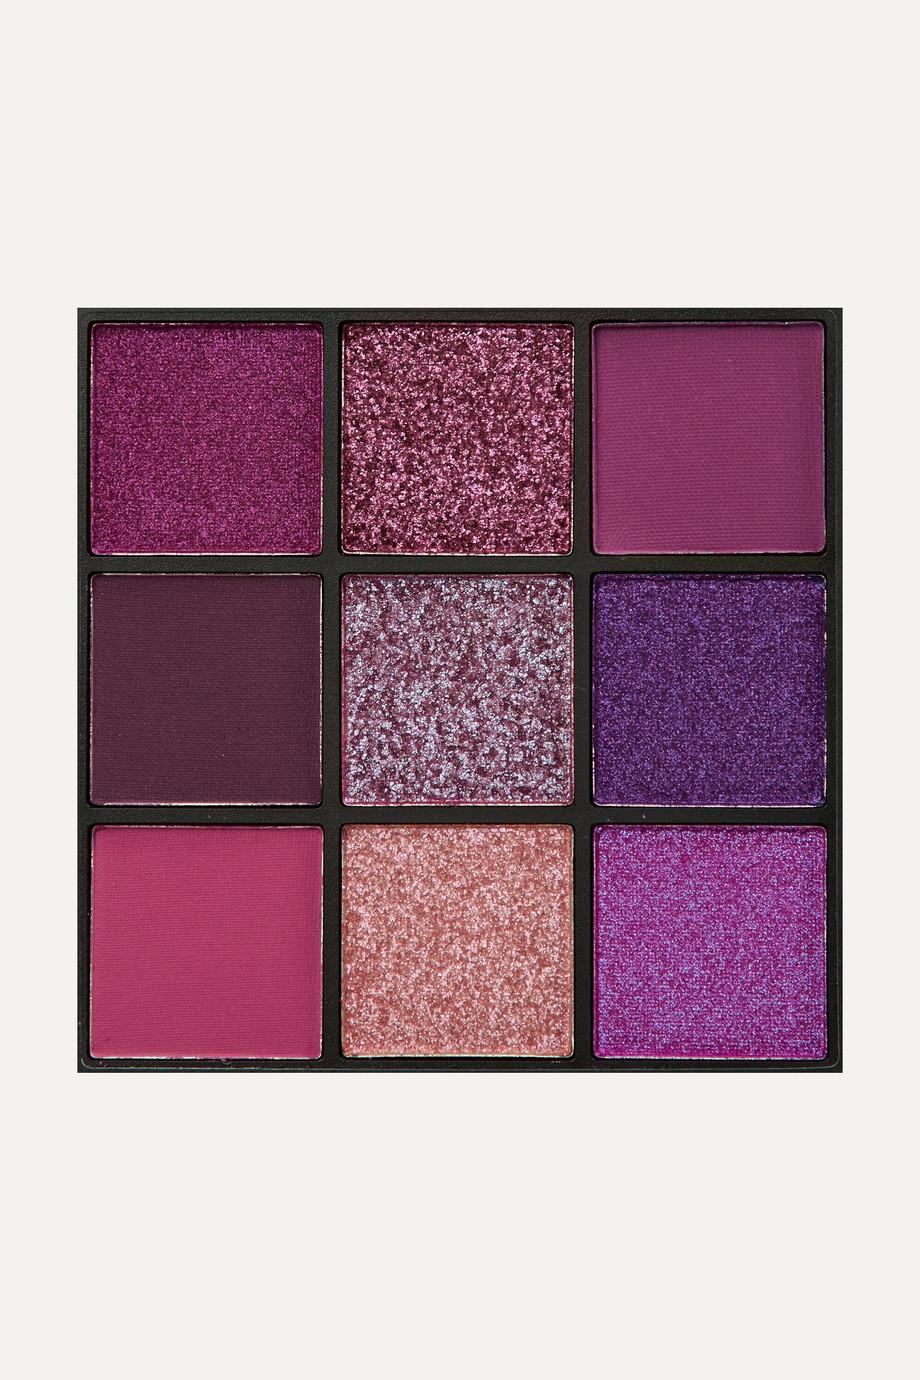 Huda Beauty Obsessions Eyeshadow Palette - Amethyst